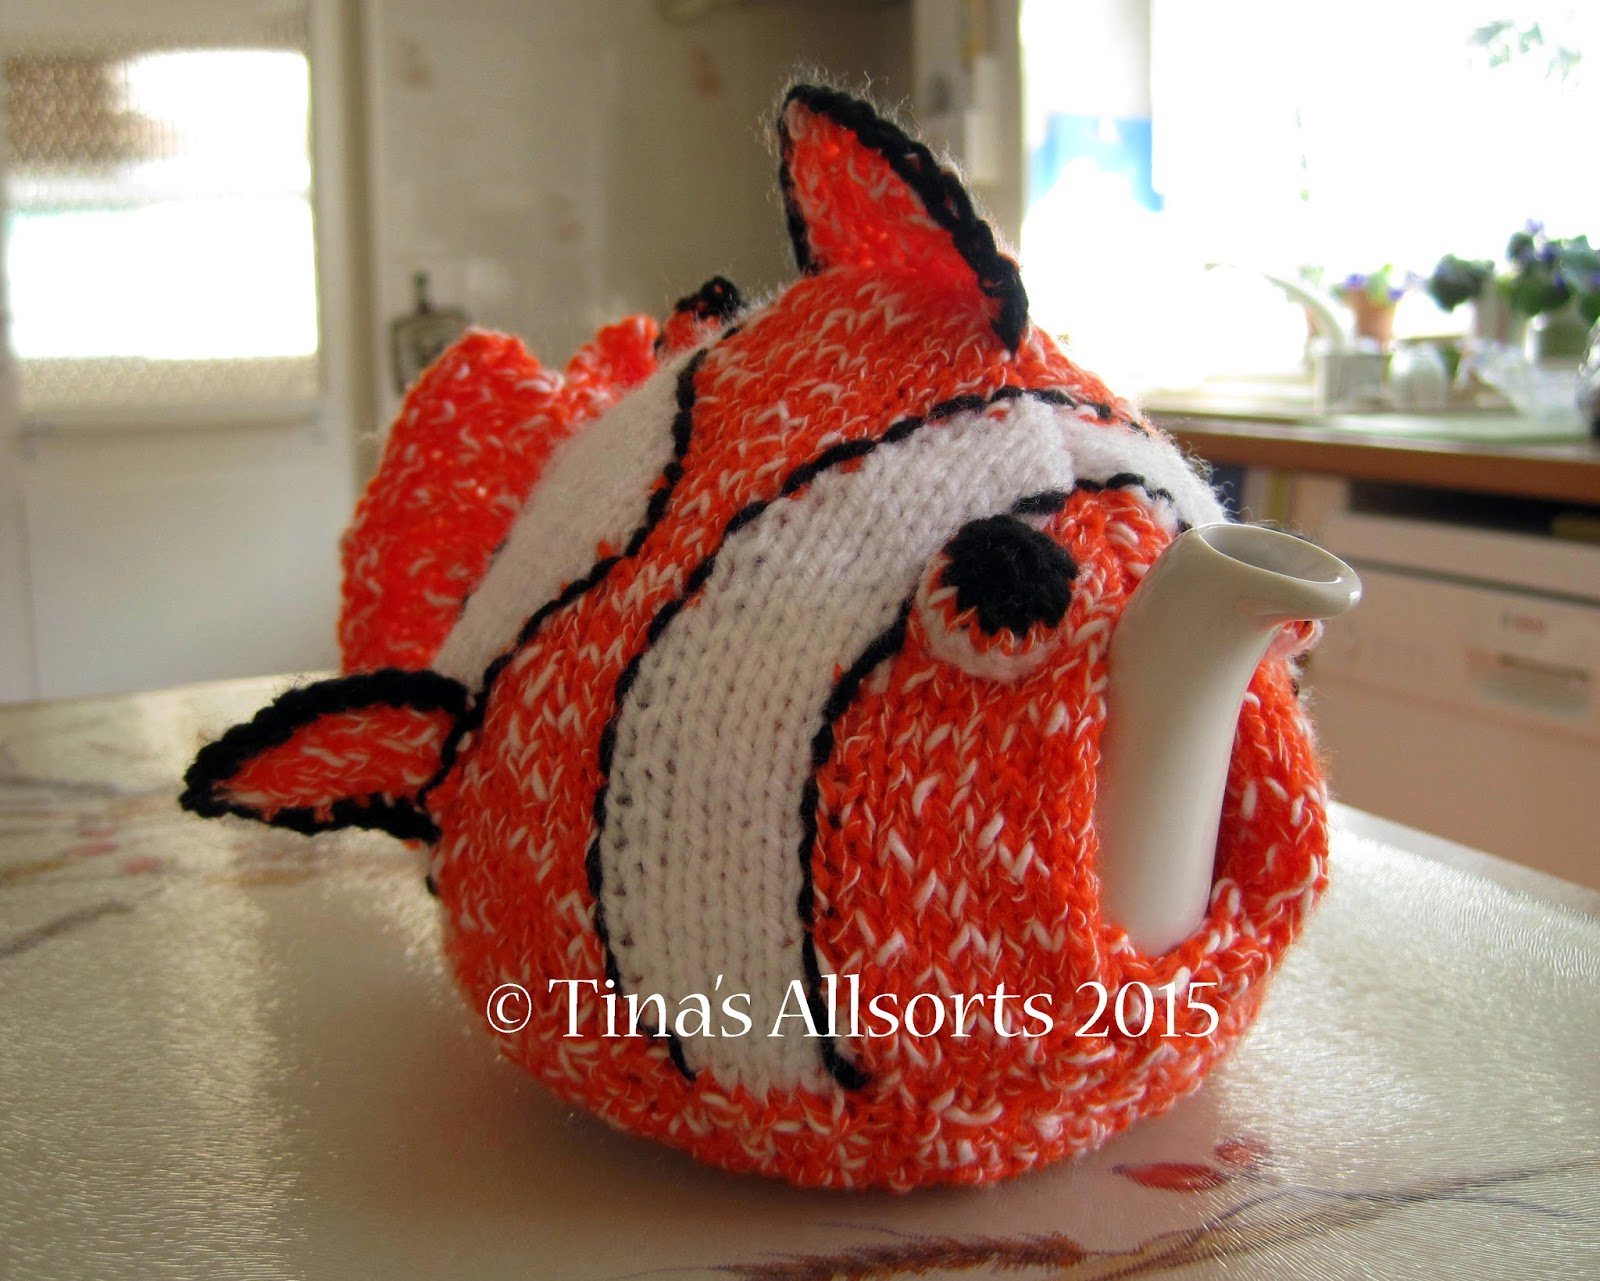 Tina's Allsorts Nemo Tea Cosie